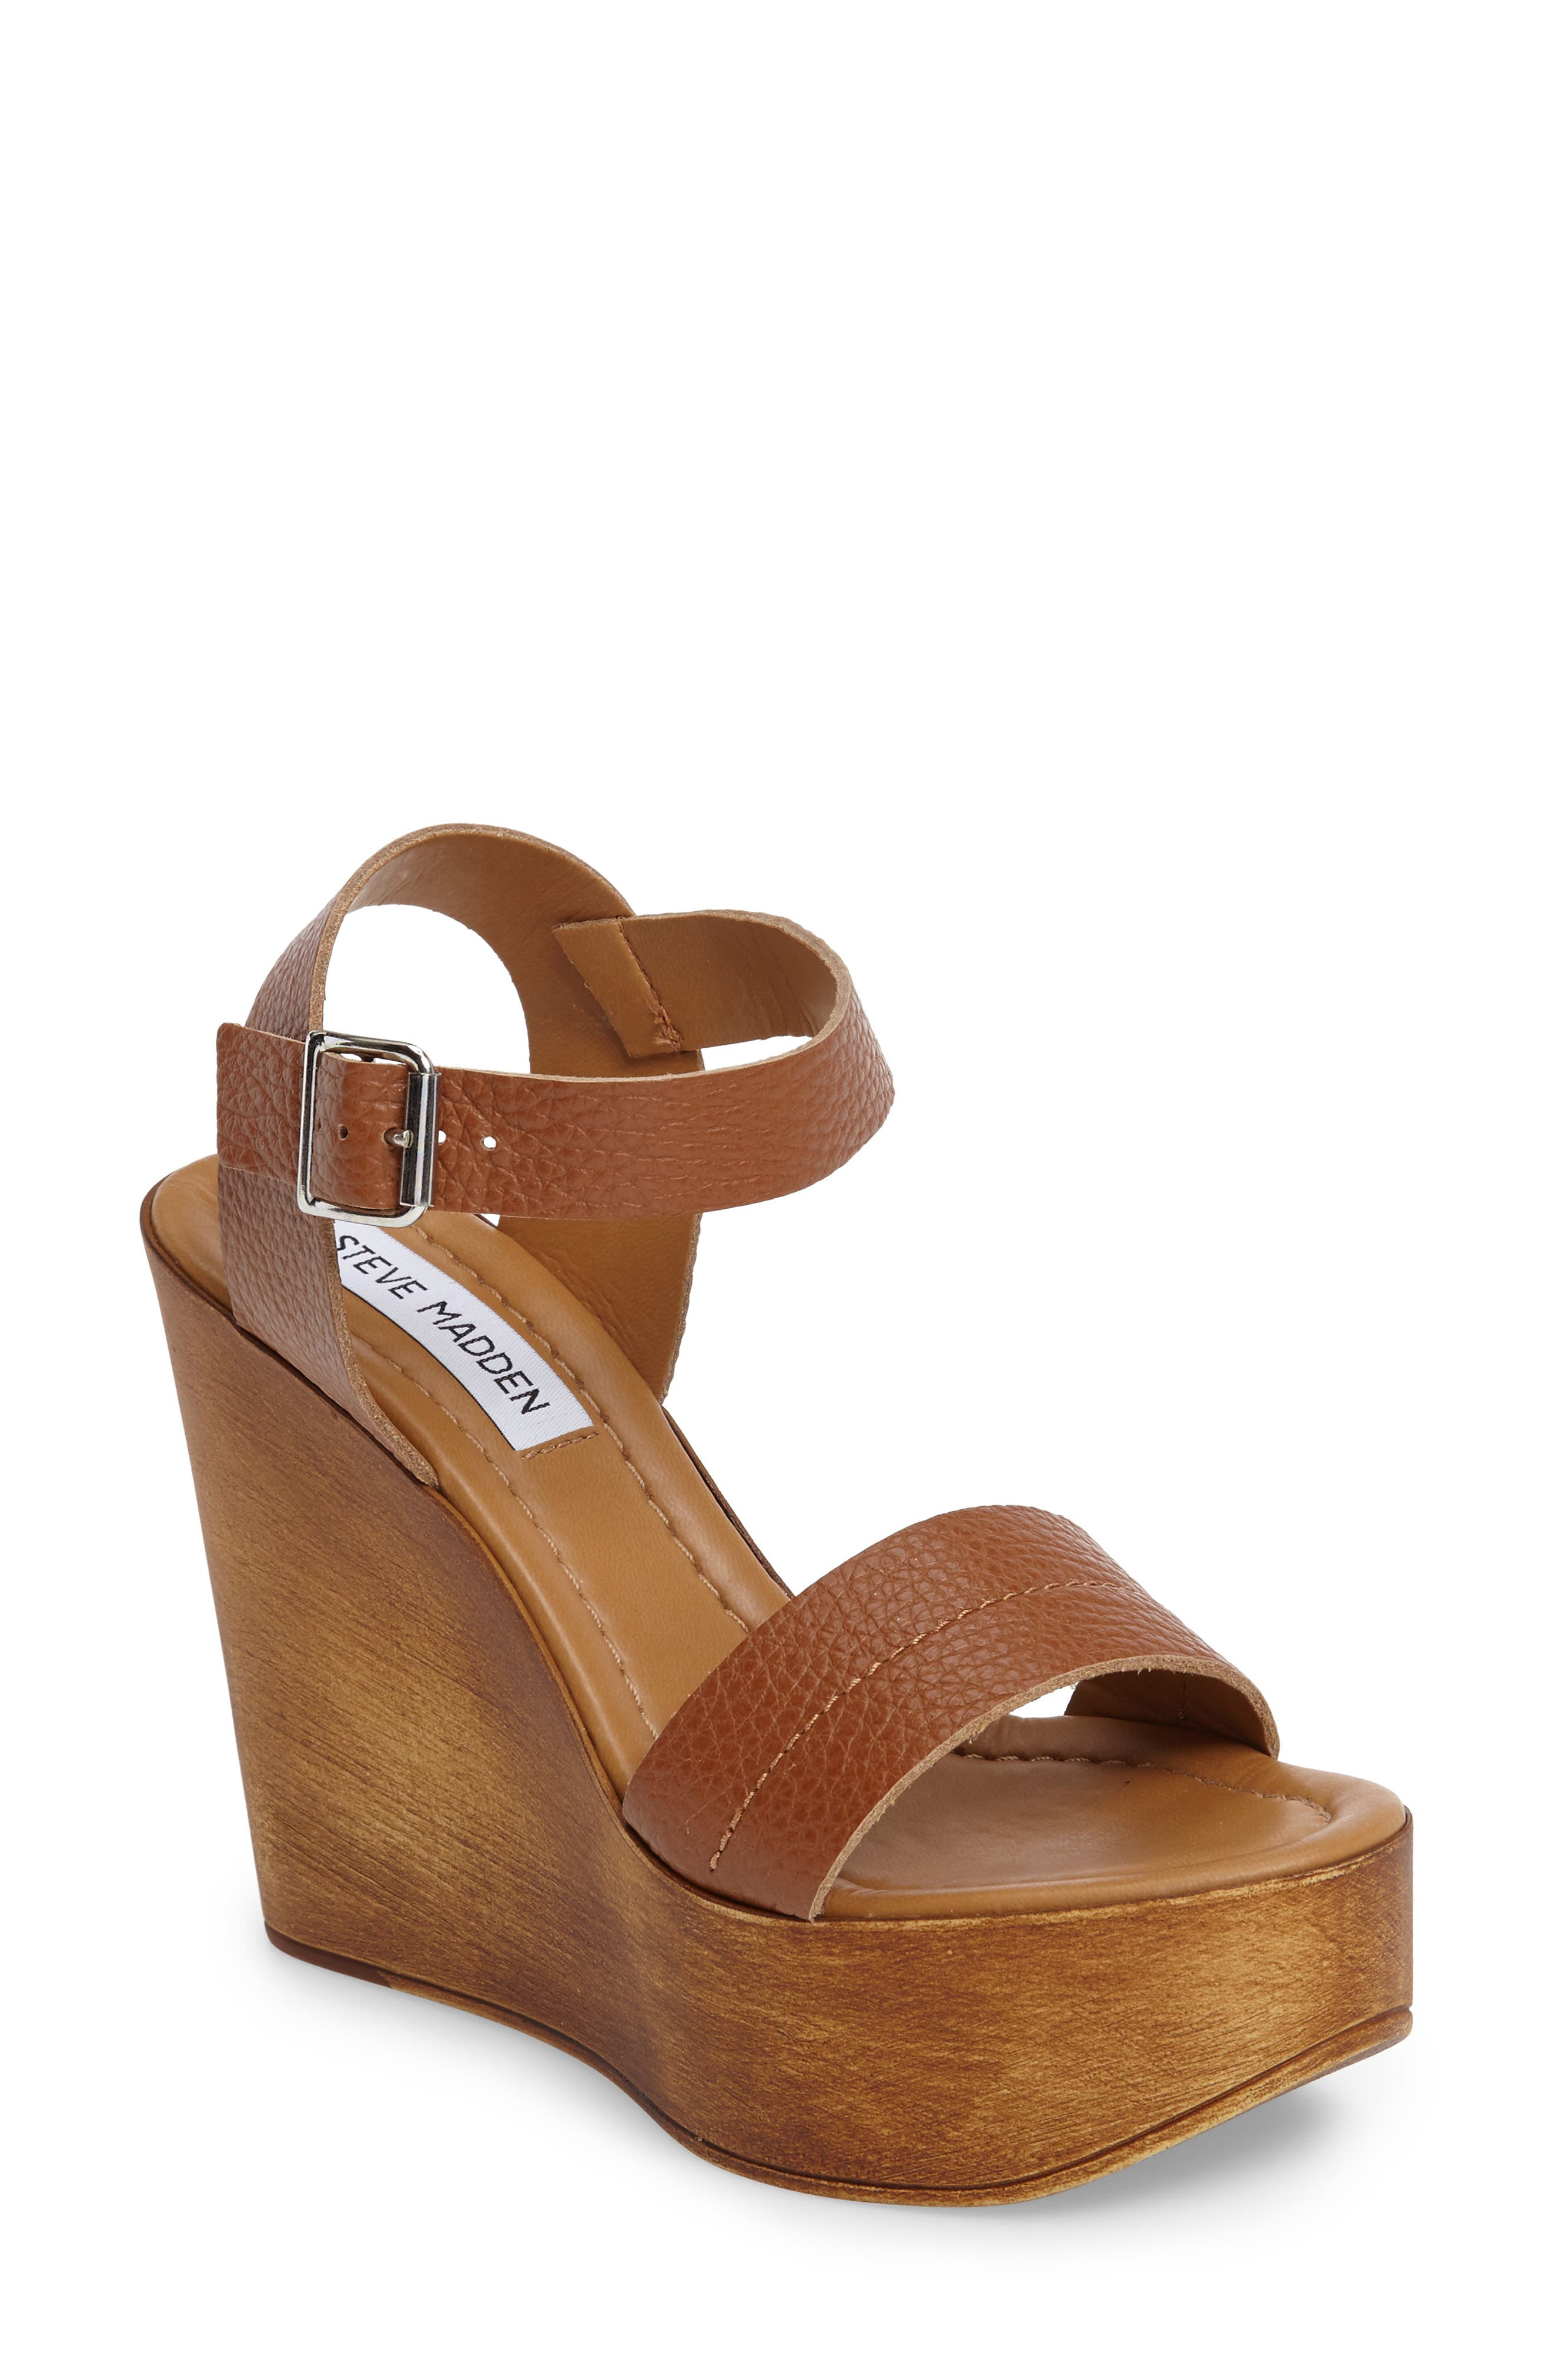 Belma Wedge Sandal,                             Main thumbnail 1, color,                             Tan Leather